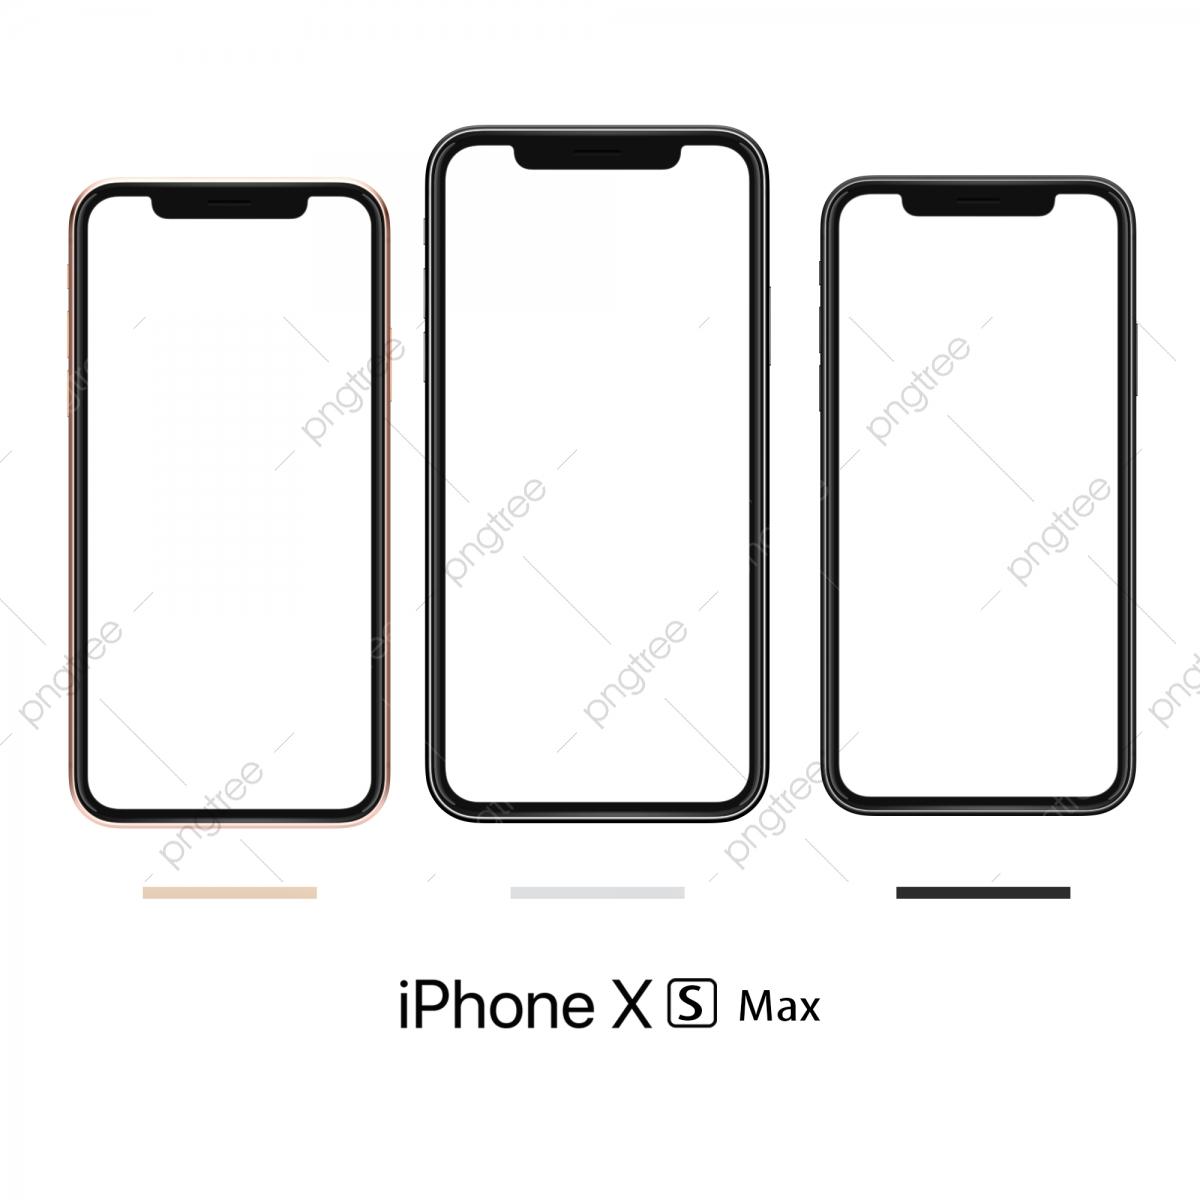 Iphone Xs Mockup Phototype Iphone Xr Xsmobile Png Transparent